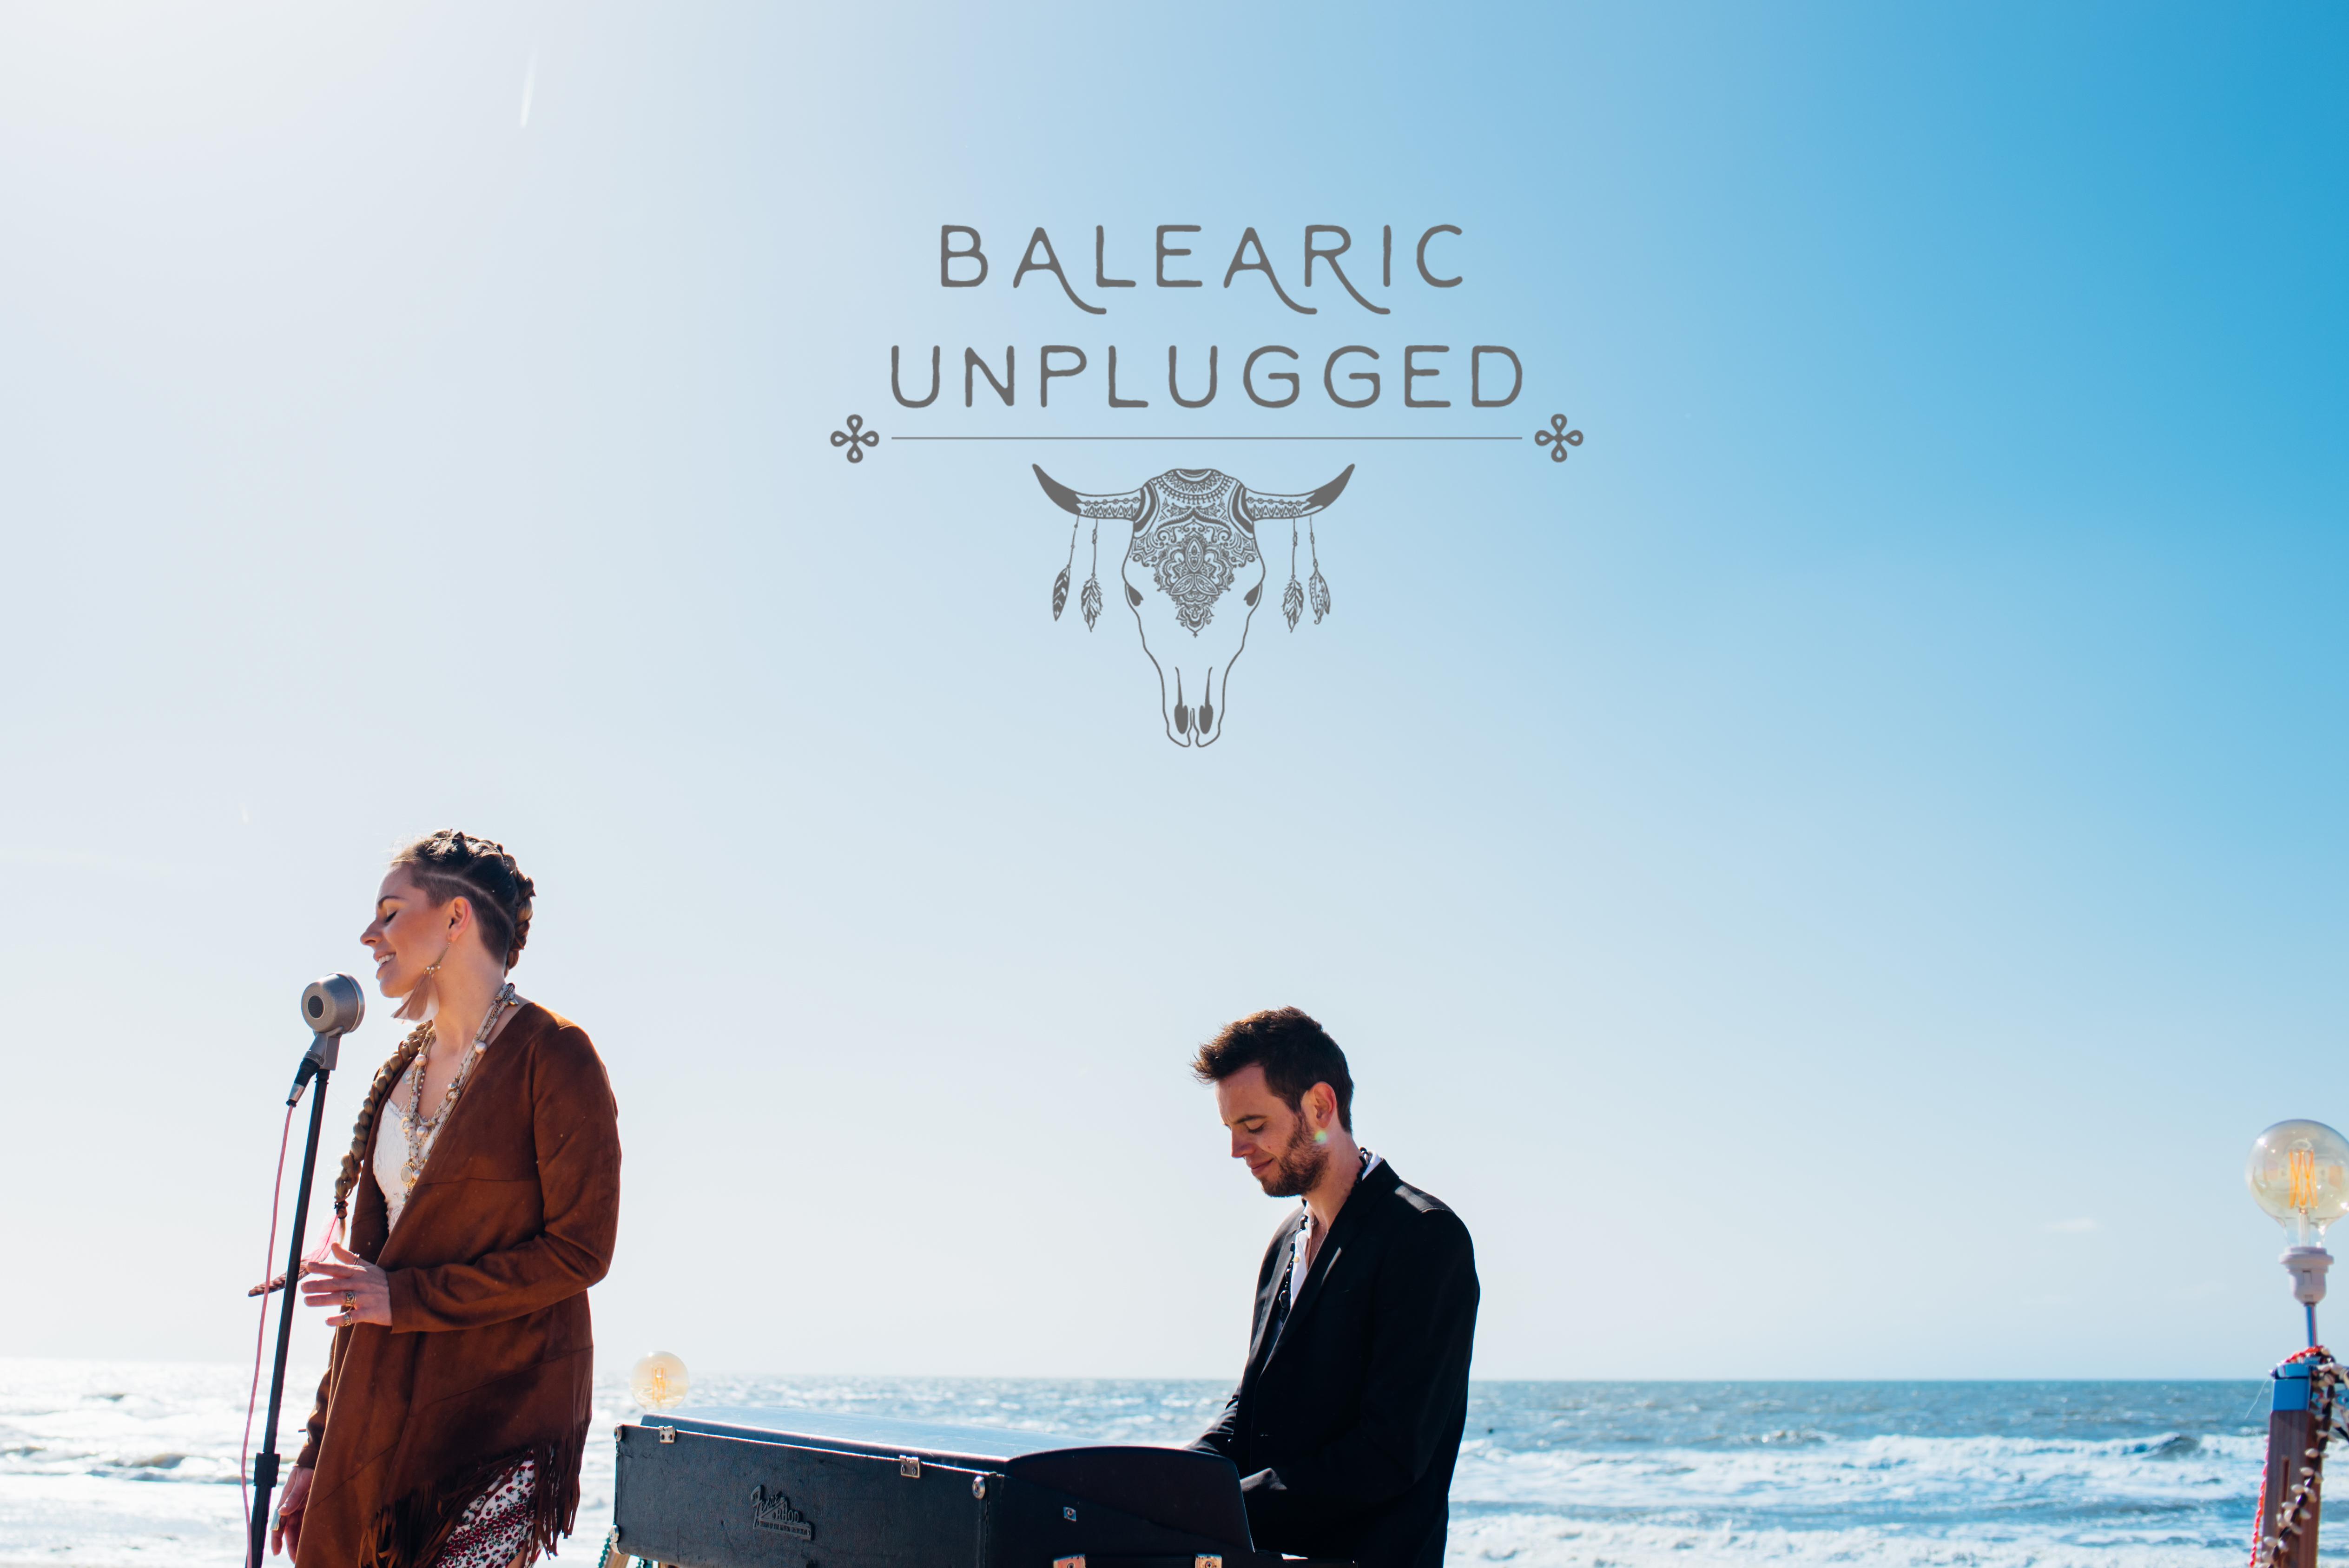 Zomerkriebels? Balearic Unplugged brengt Ibiza naar je toe!